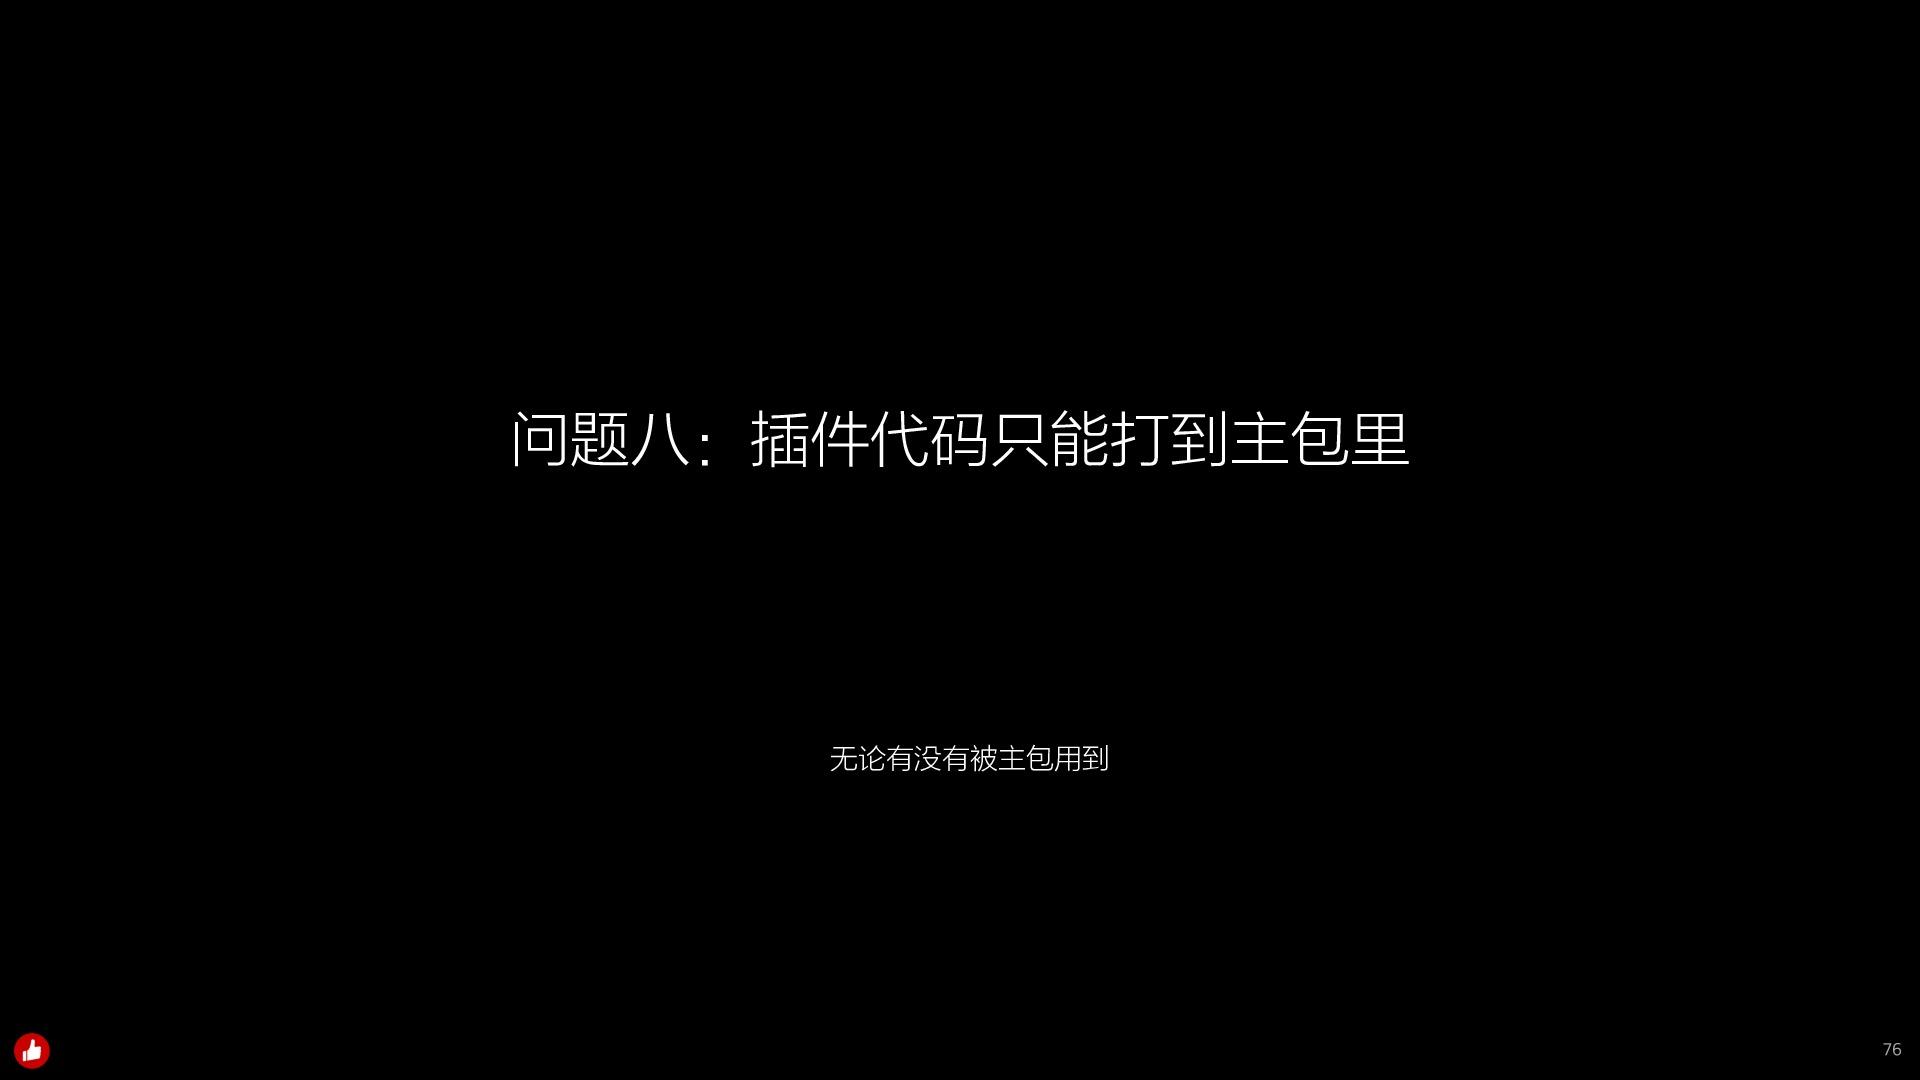 https://opentalk-blog.b0.upaiyun.com/prod/2018-11-26/f64075f151e8cca9c5350495a1f47673